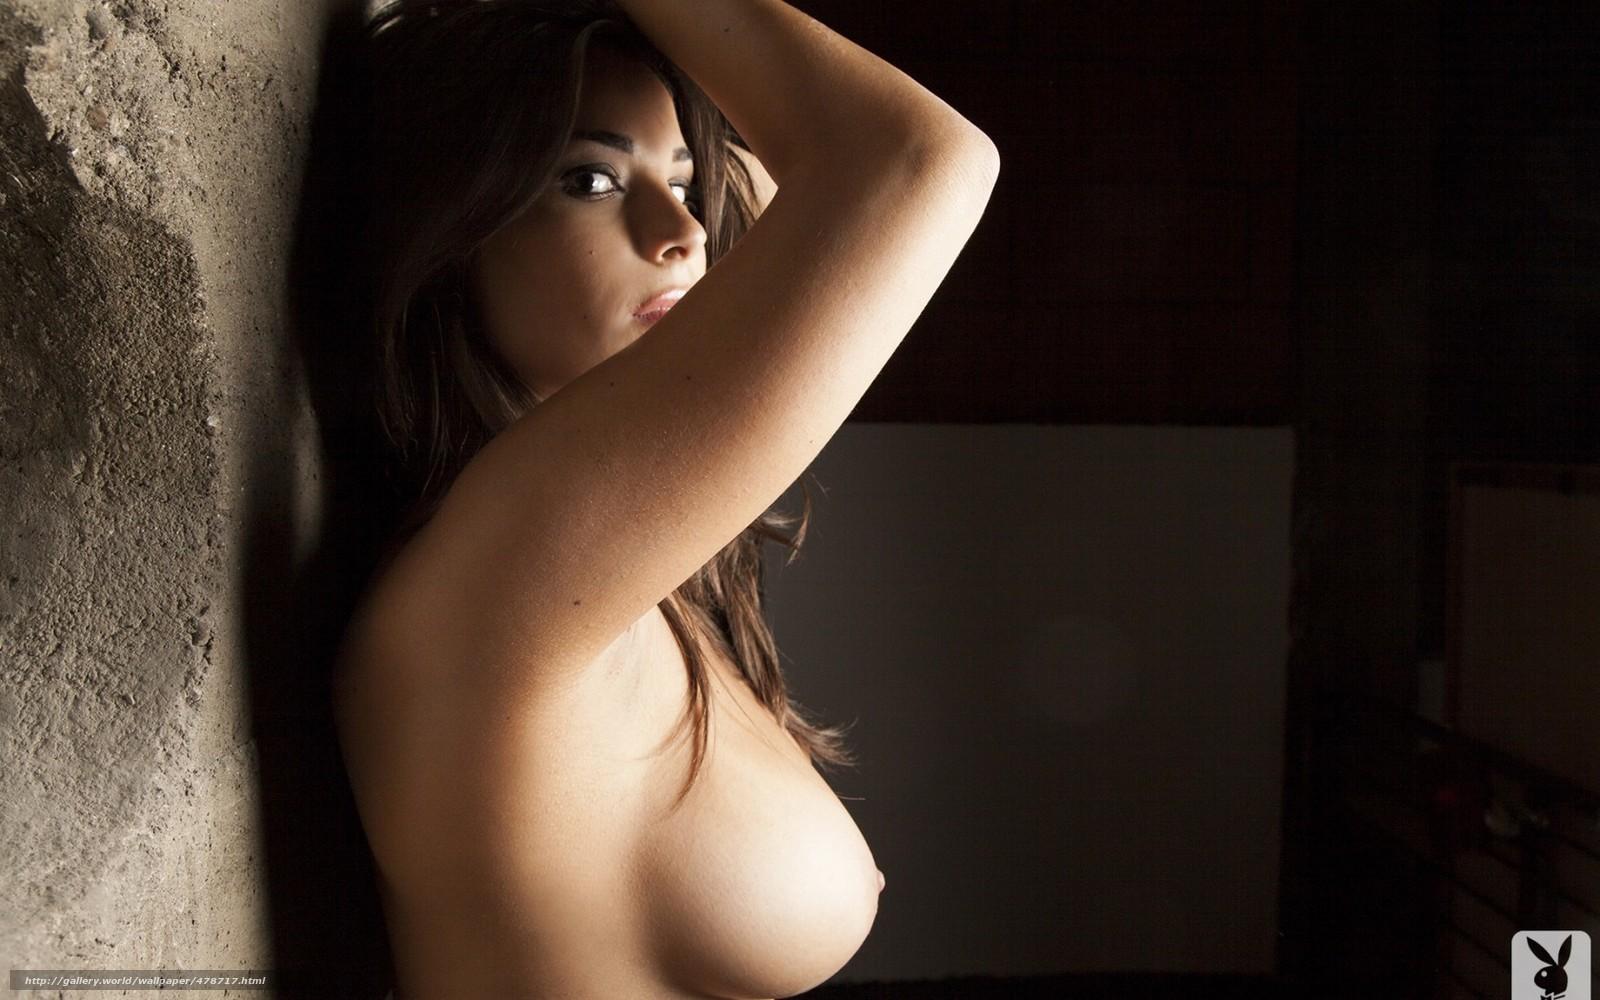 Фото груди 3 размер онлайн 16 фотография